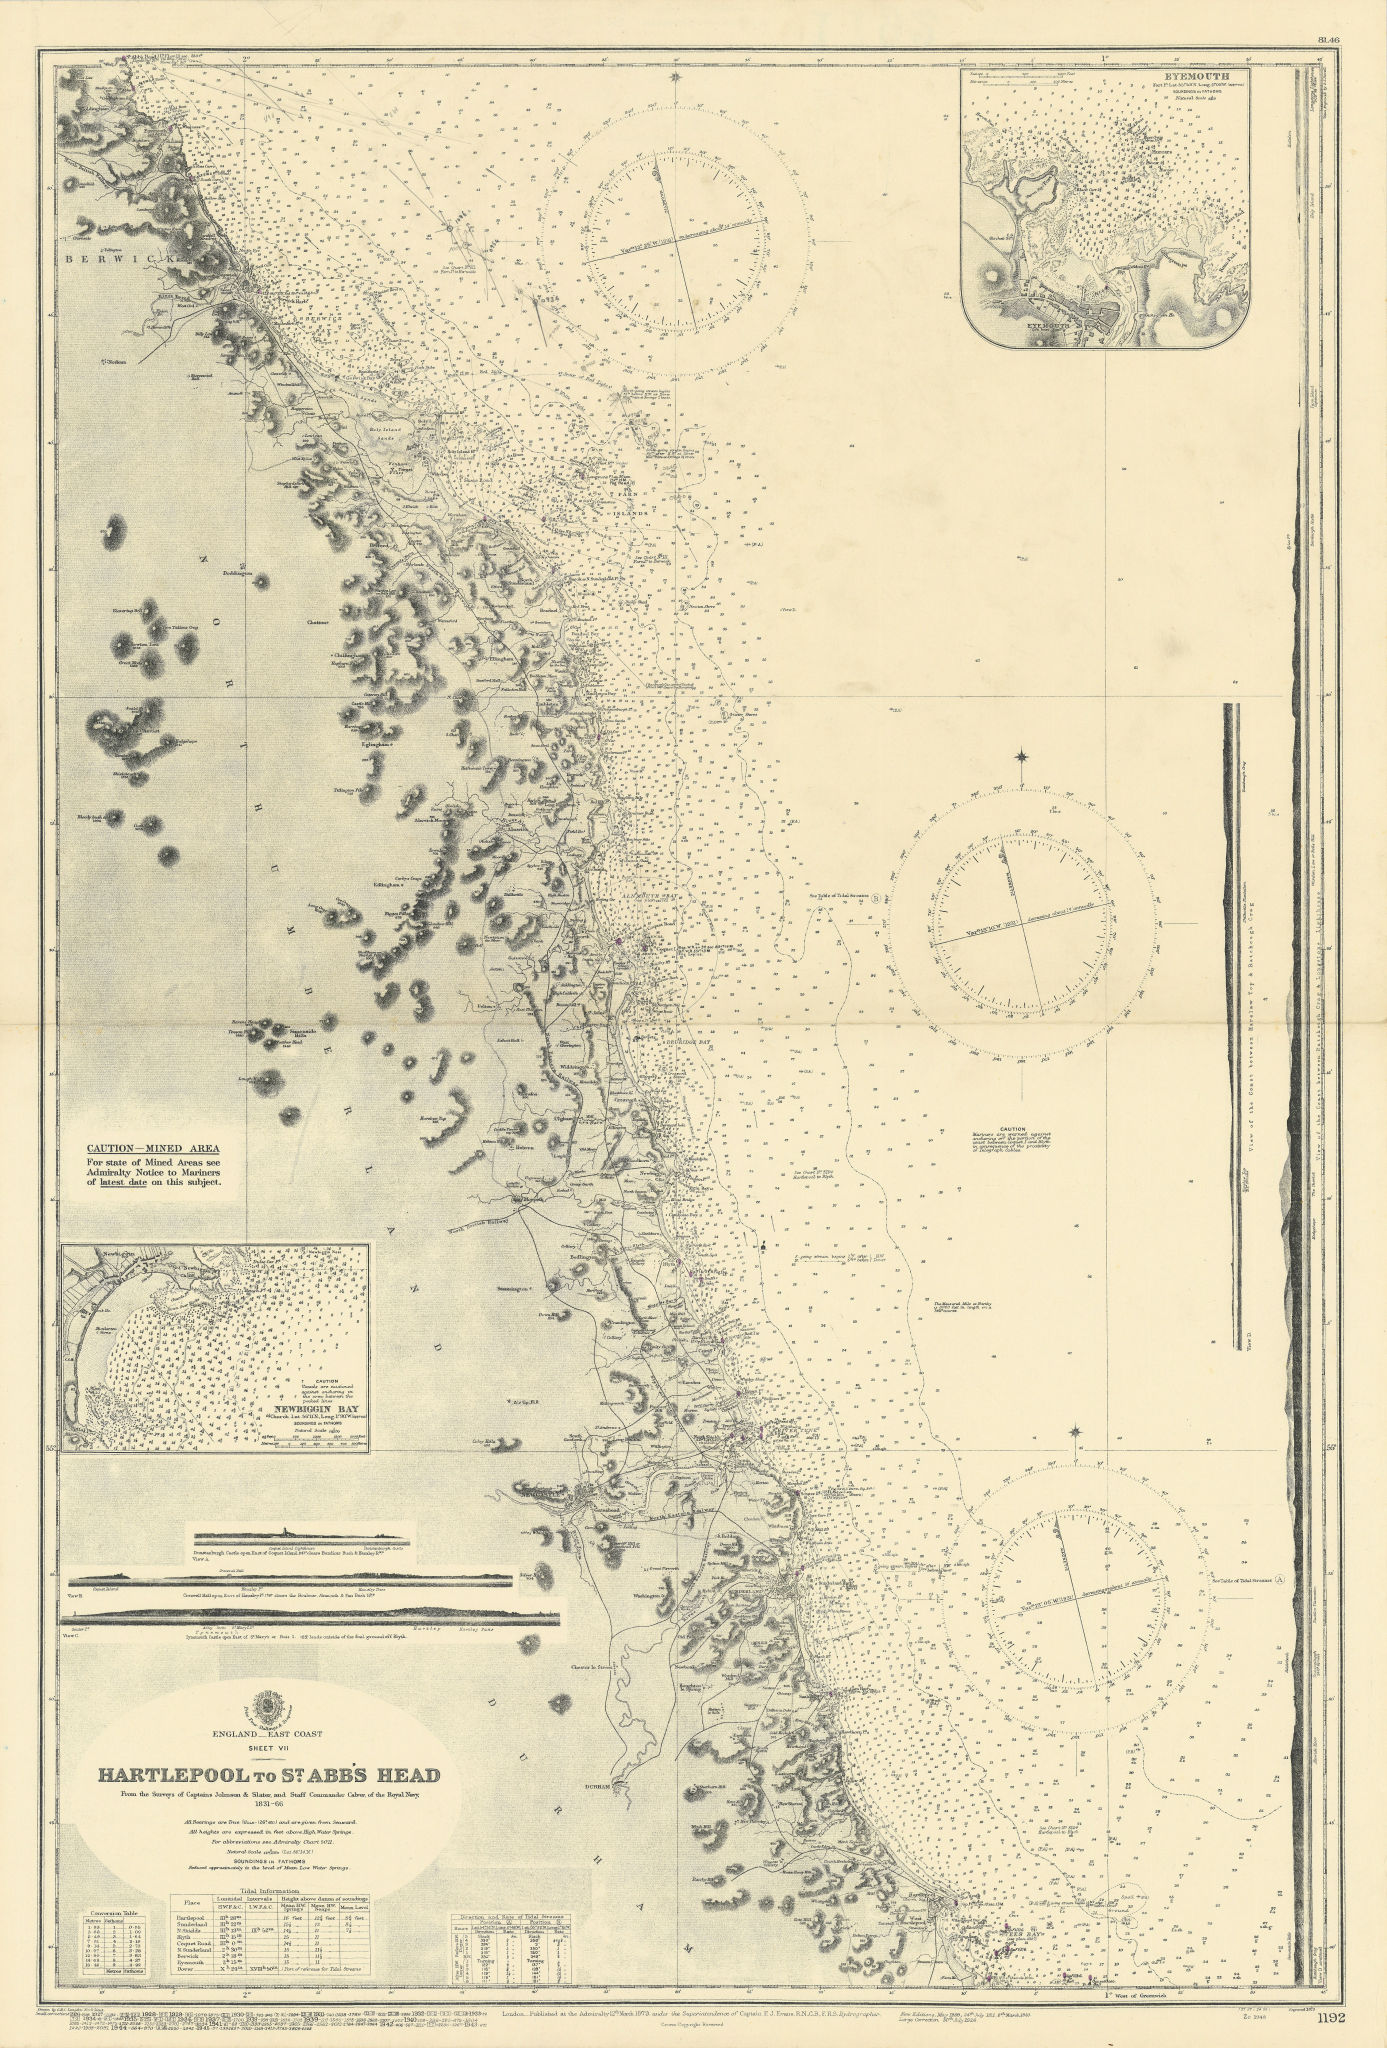 Northeast England coast. Hartlepool-Eyemouth ADMIRALTY sea chart 1879 (1945) map